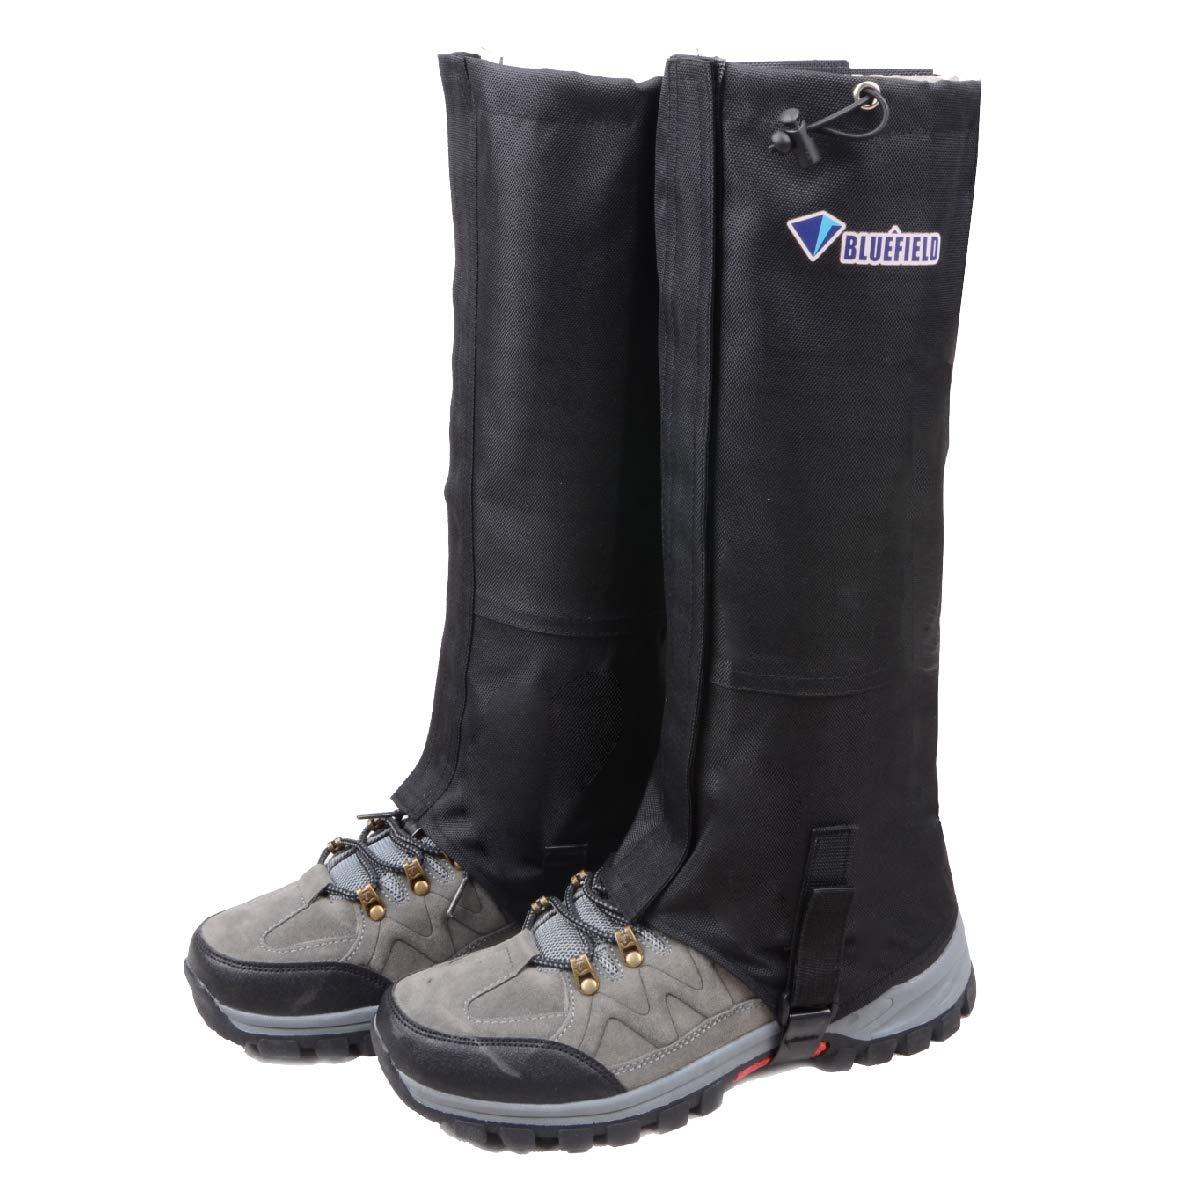 TRIWONDER Leg Gaiters Waterproof Snow Boot Gators Hiking Gaiters Men Women for Walking Climbing Hunting Cycling Backpacking Lightweight Rain Shoe Gaiters (1 Pair) (Black, XL) by TRIWONDER